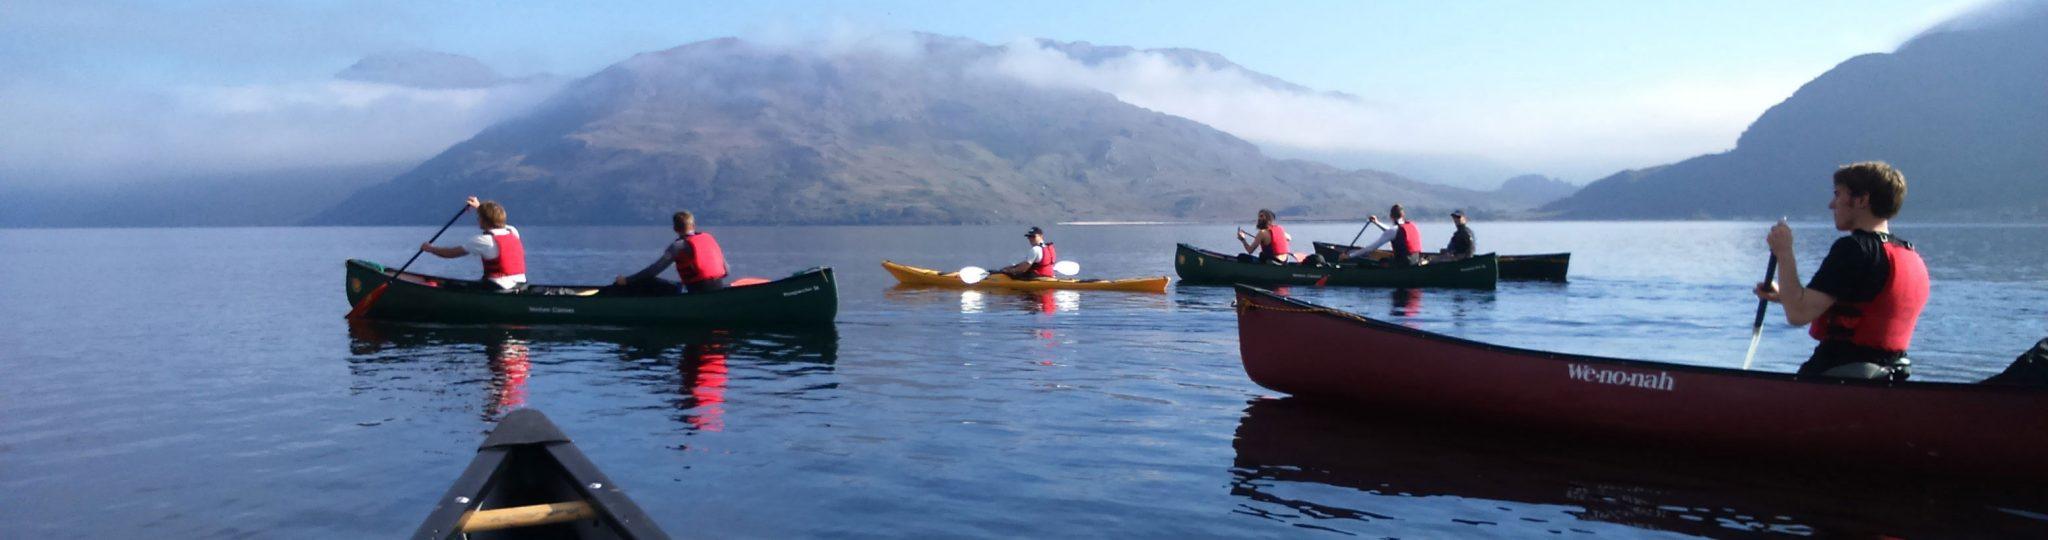 Canoe Trip Gift Voucher